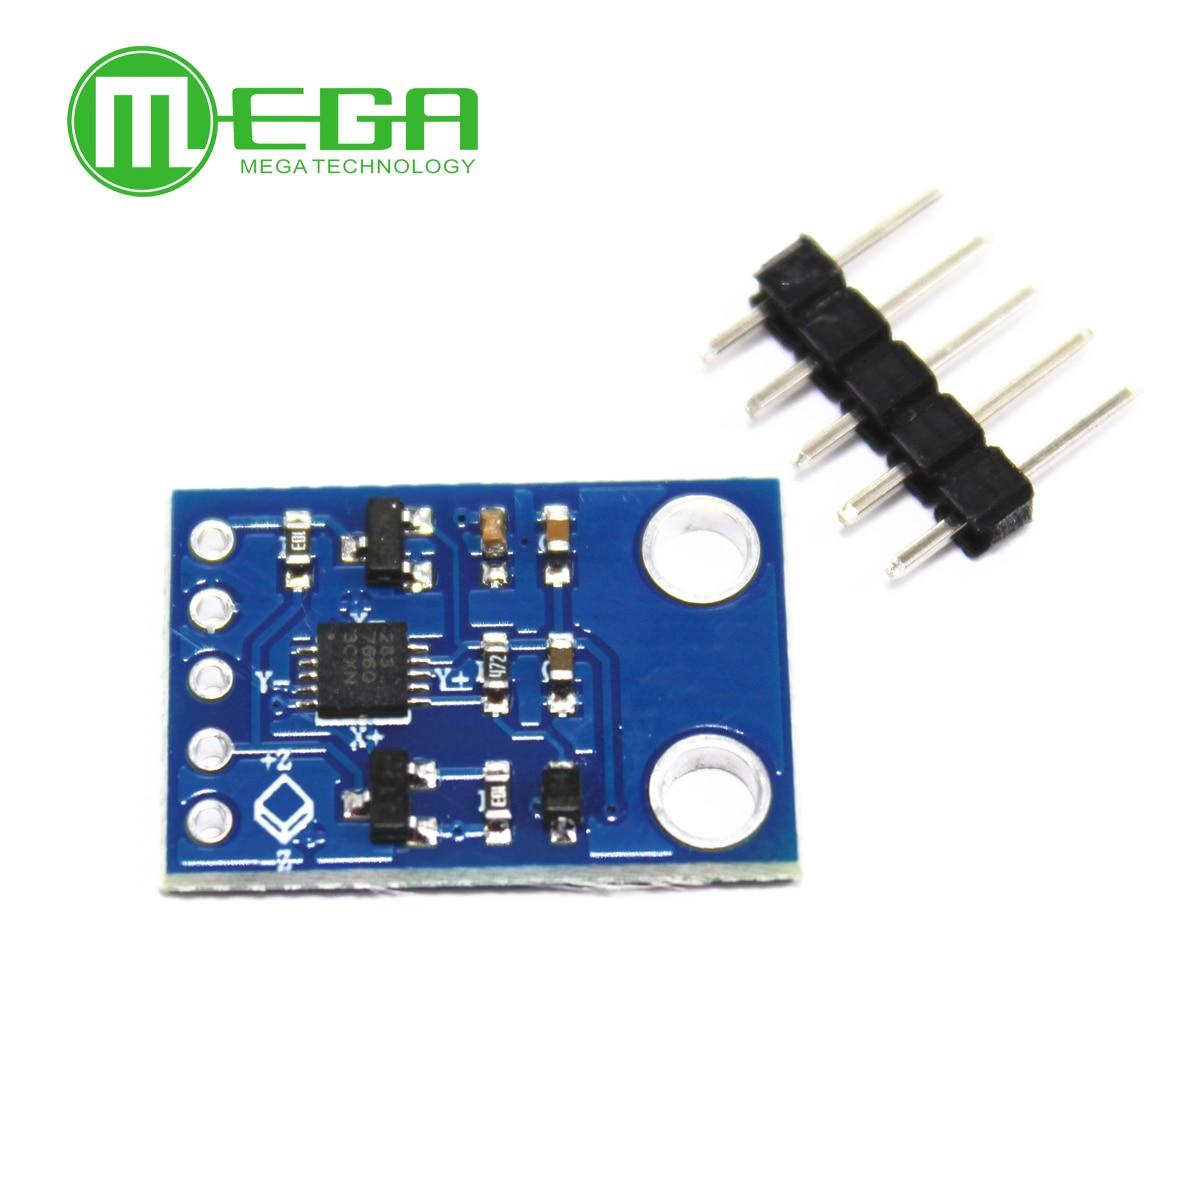 MMA7660 Module 3 Axis Accelerometer I2C Low //-1.5g MEMS Arduino